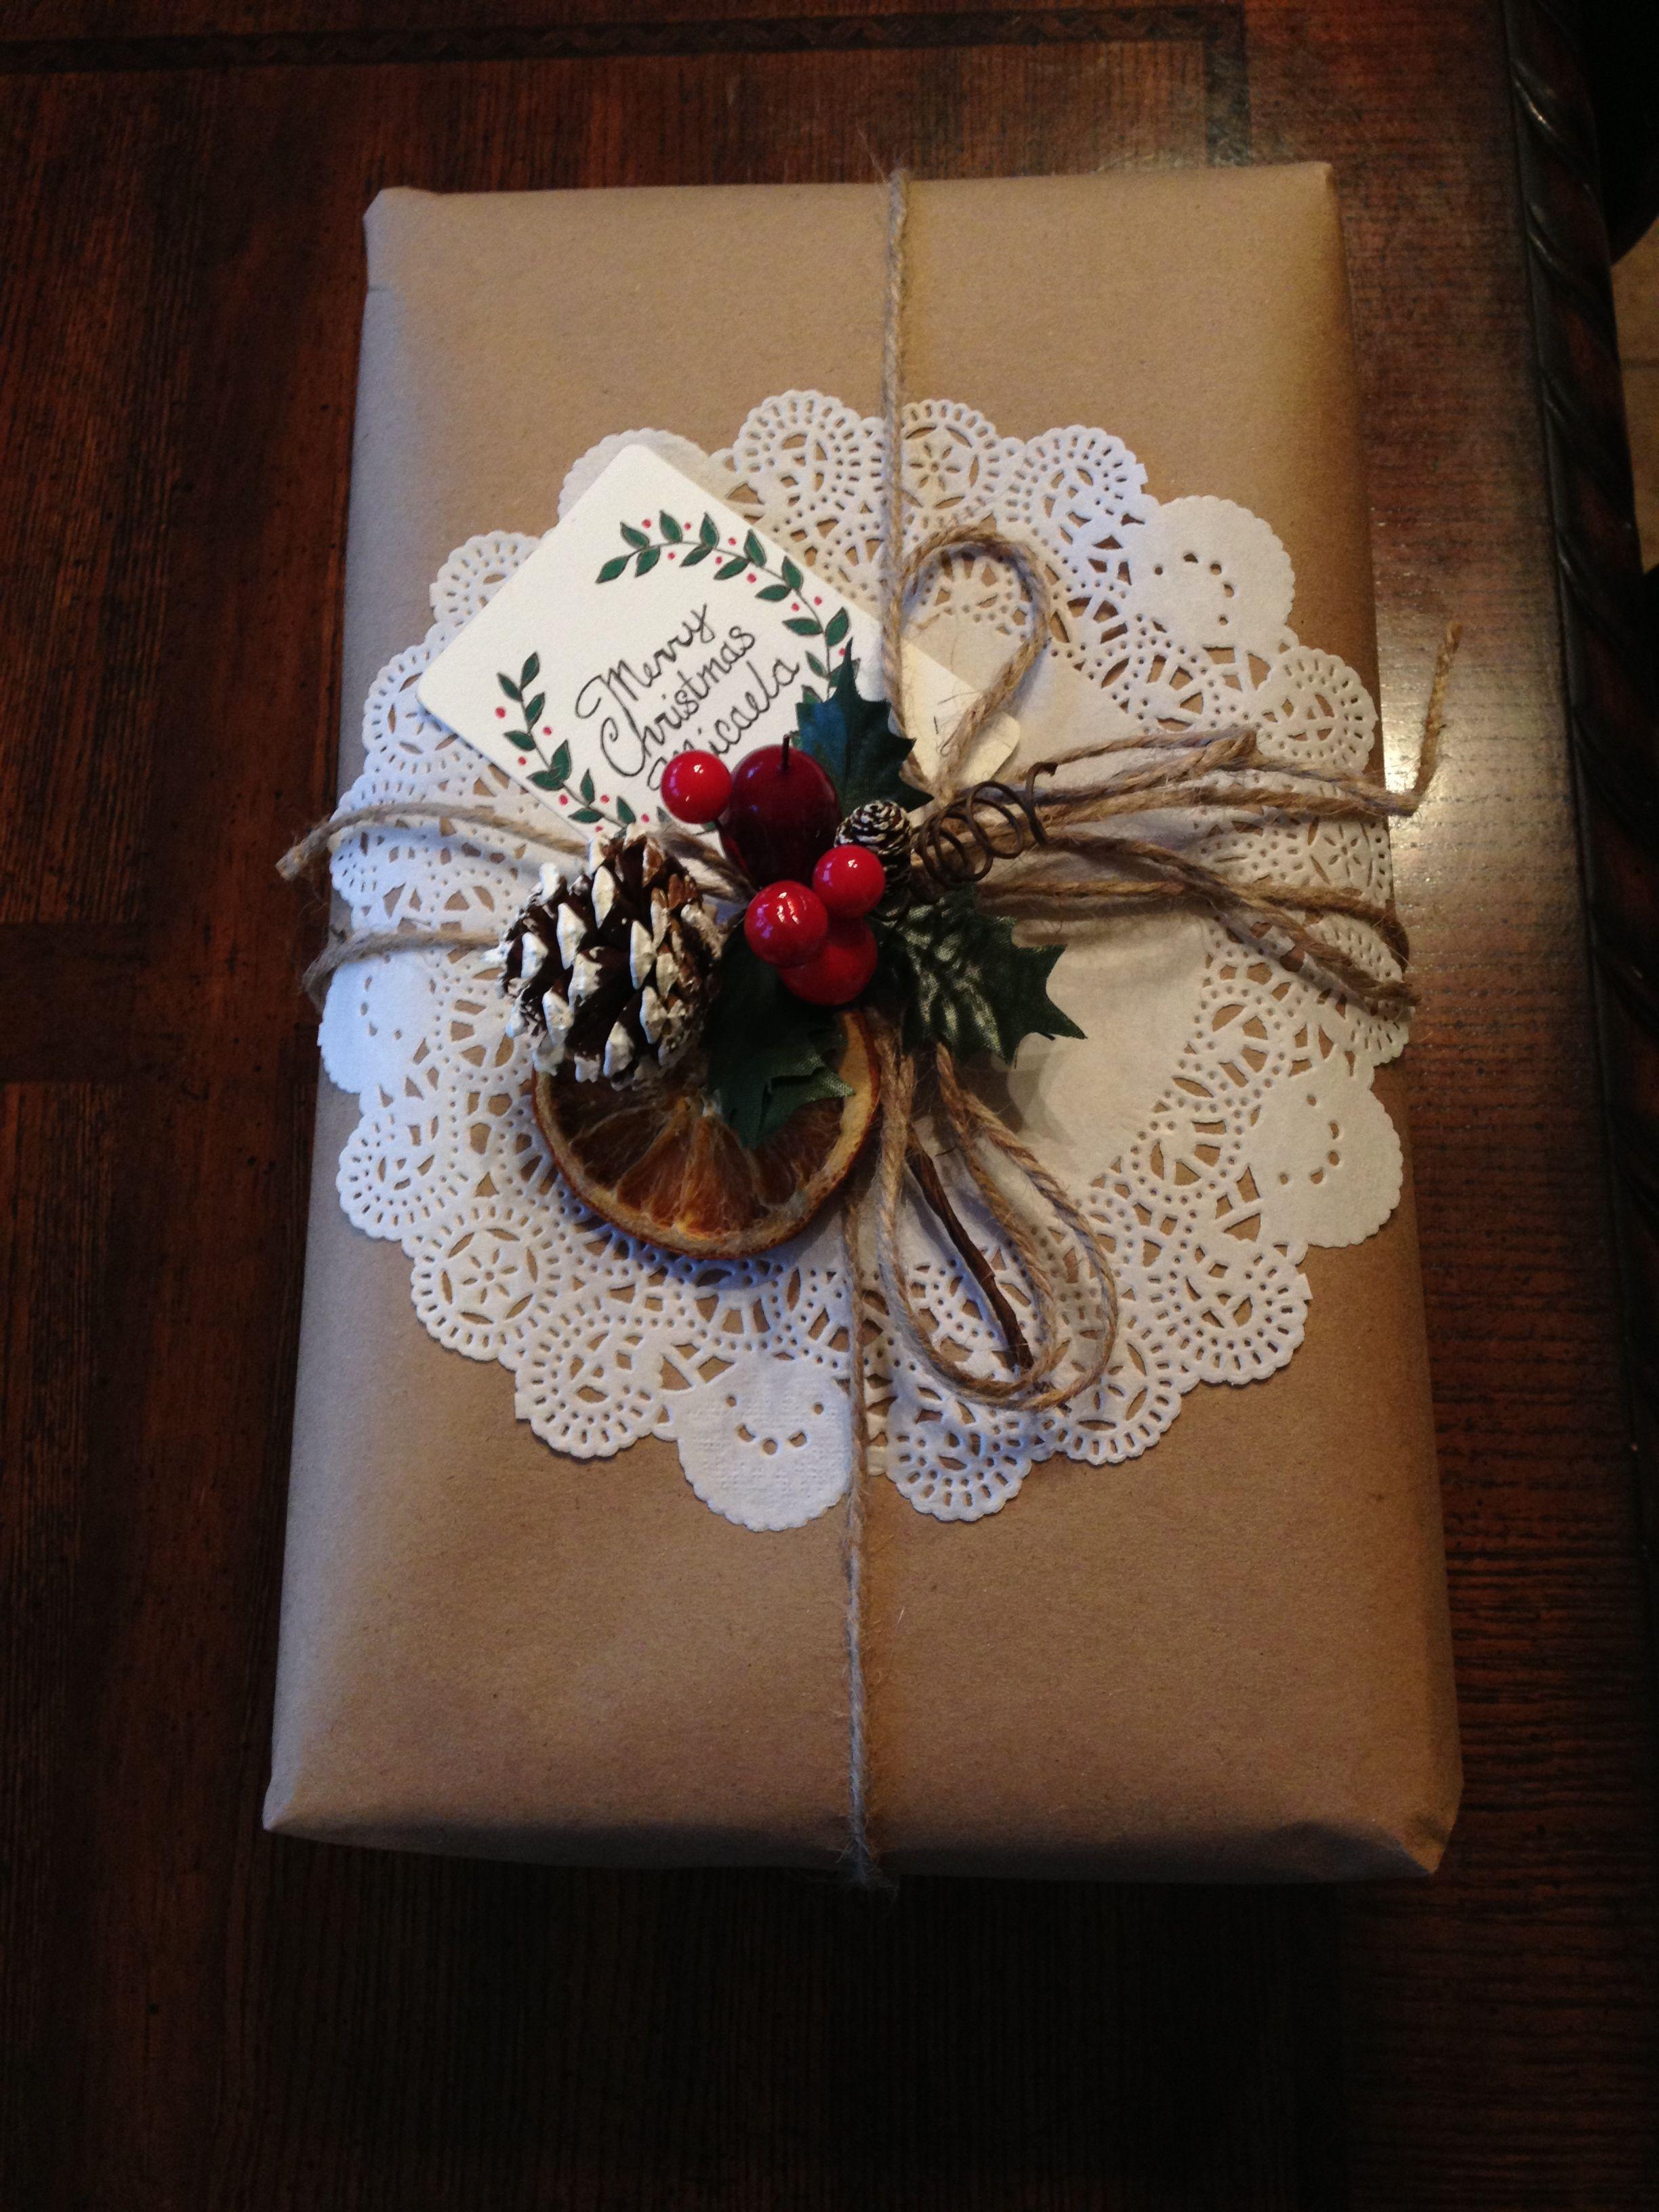 geschenkverpackung geschenkideen pinterest geschenke verpacken geschenke und weihnachten. Black Bedroom Furniture Sets. Home Design Ideas